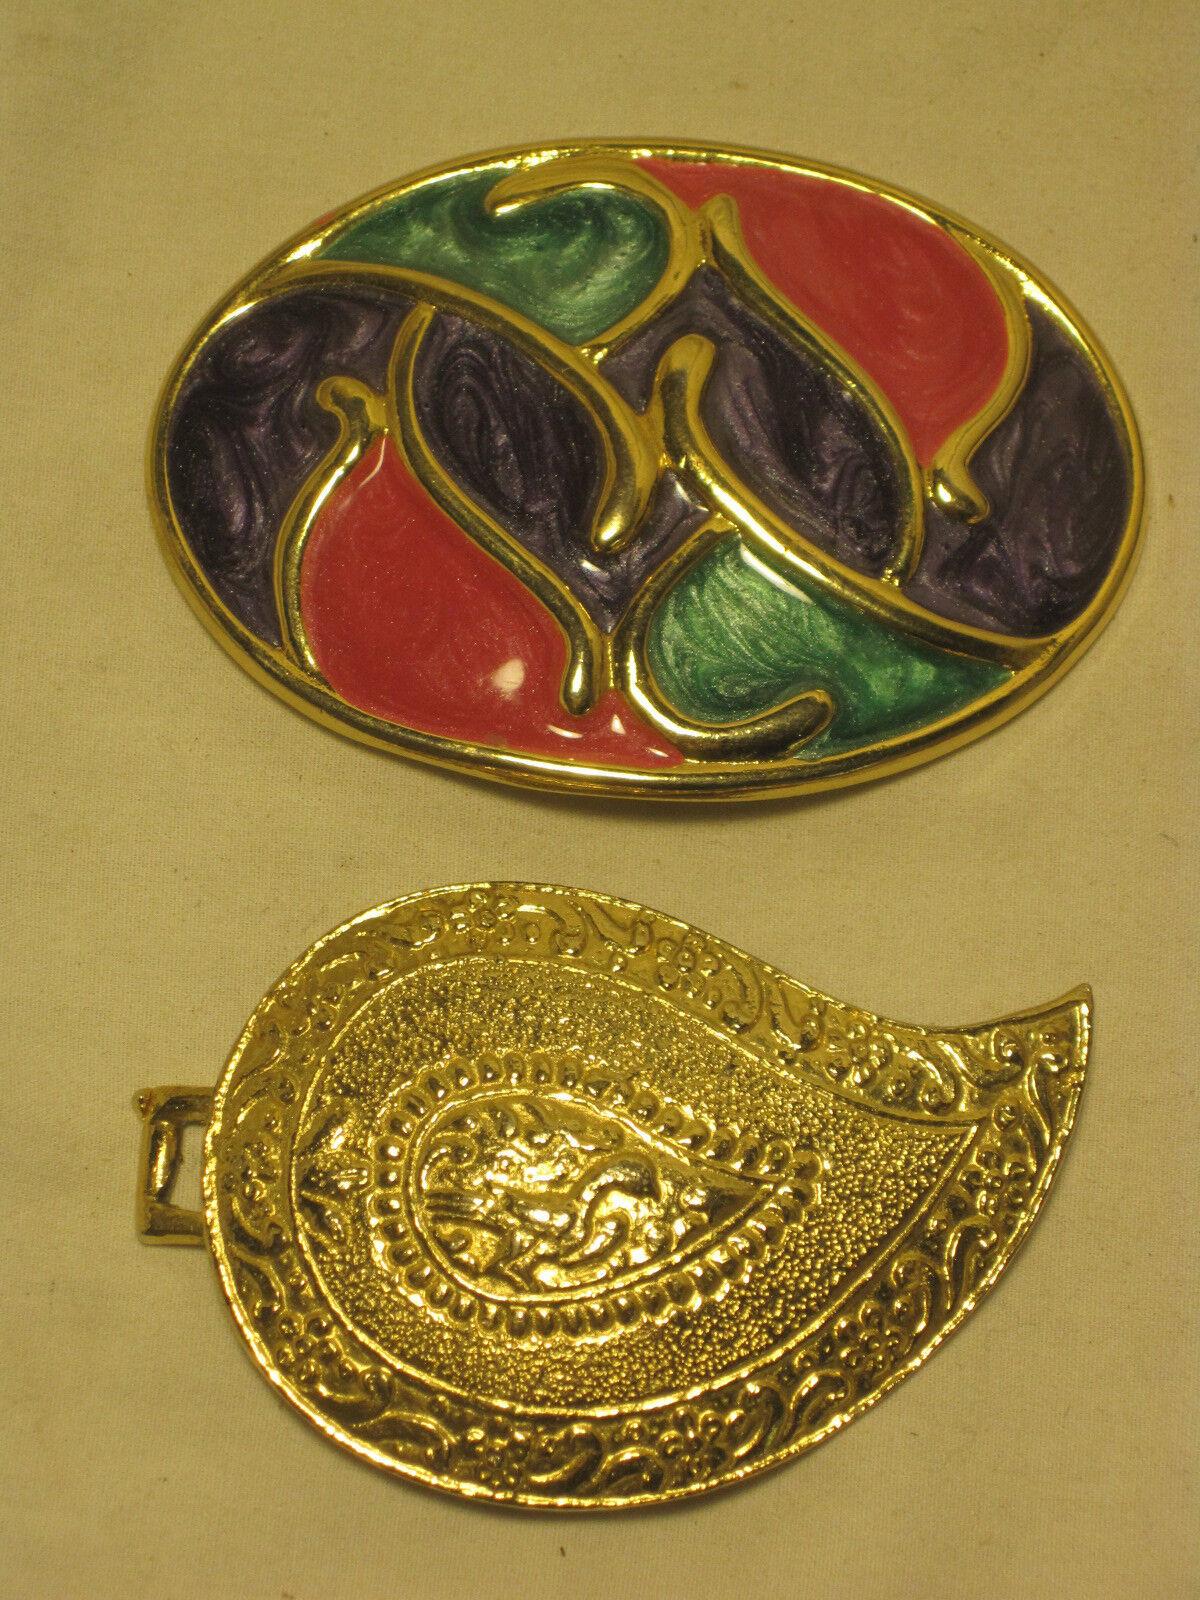 2 vintage women's belt buckle buckles 1985 Gay Boyer ornate Nan Lewis enamel